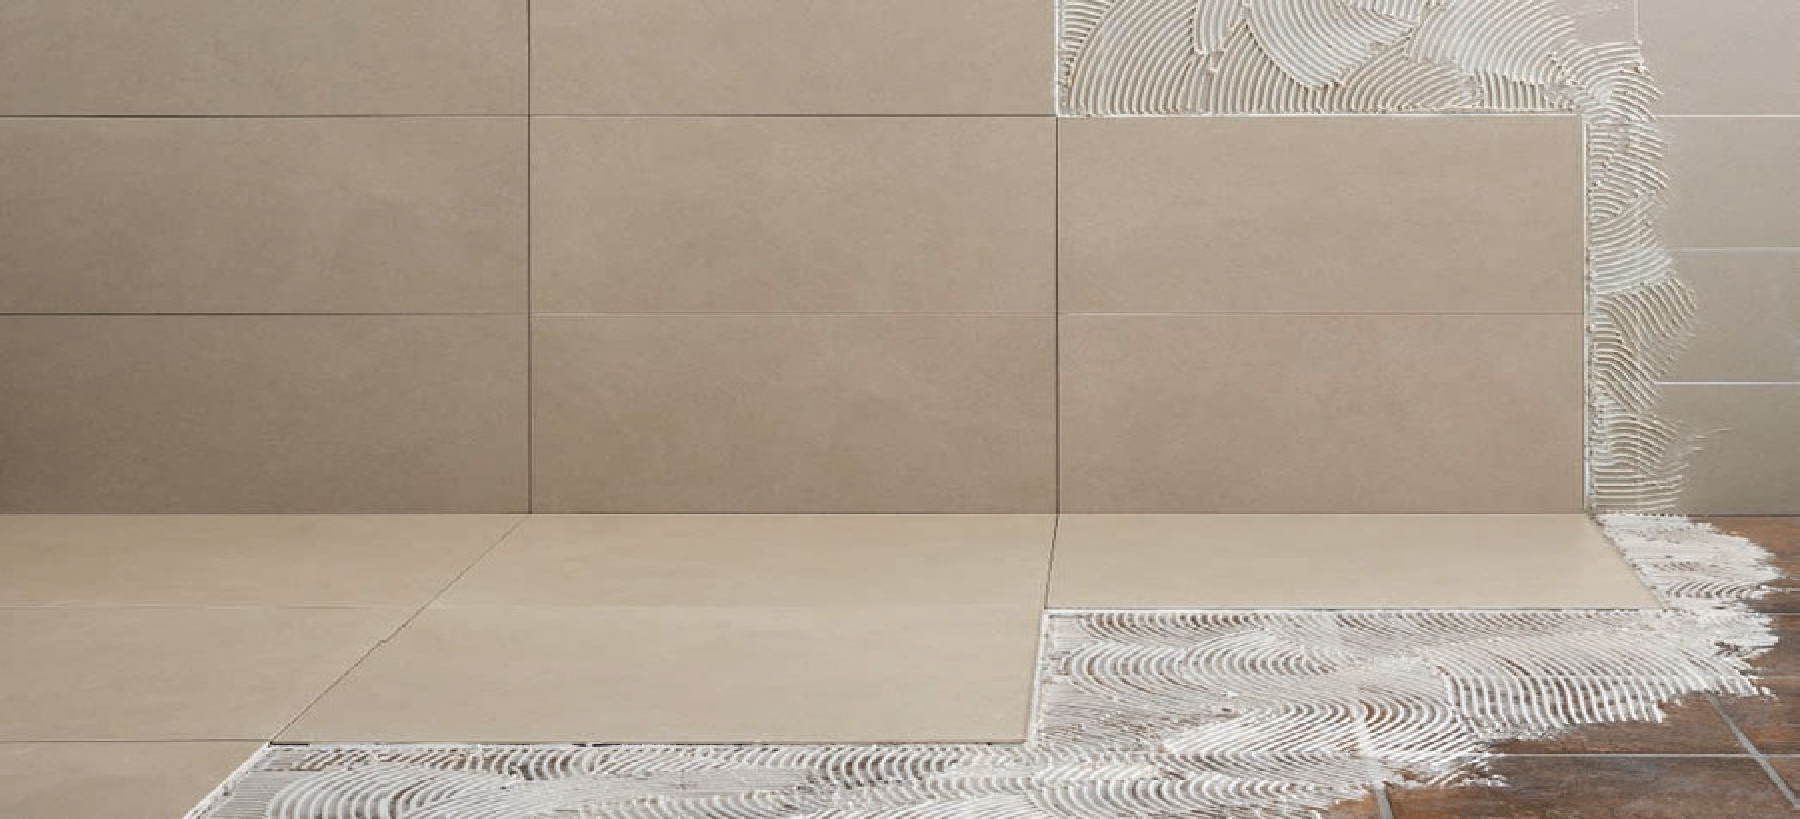 Pavimenti per esterni piastrelle sottili posa su pavimenti esistenti - Piastrelle pavimento esterno ...